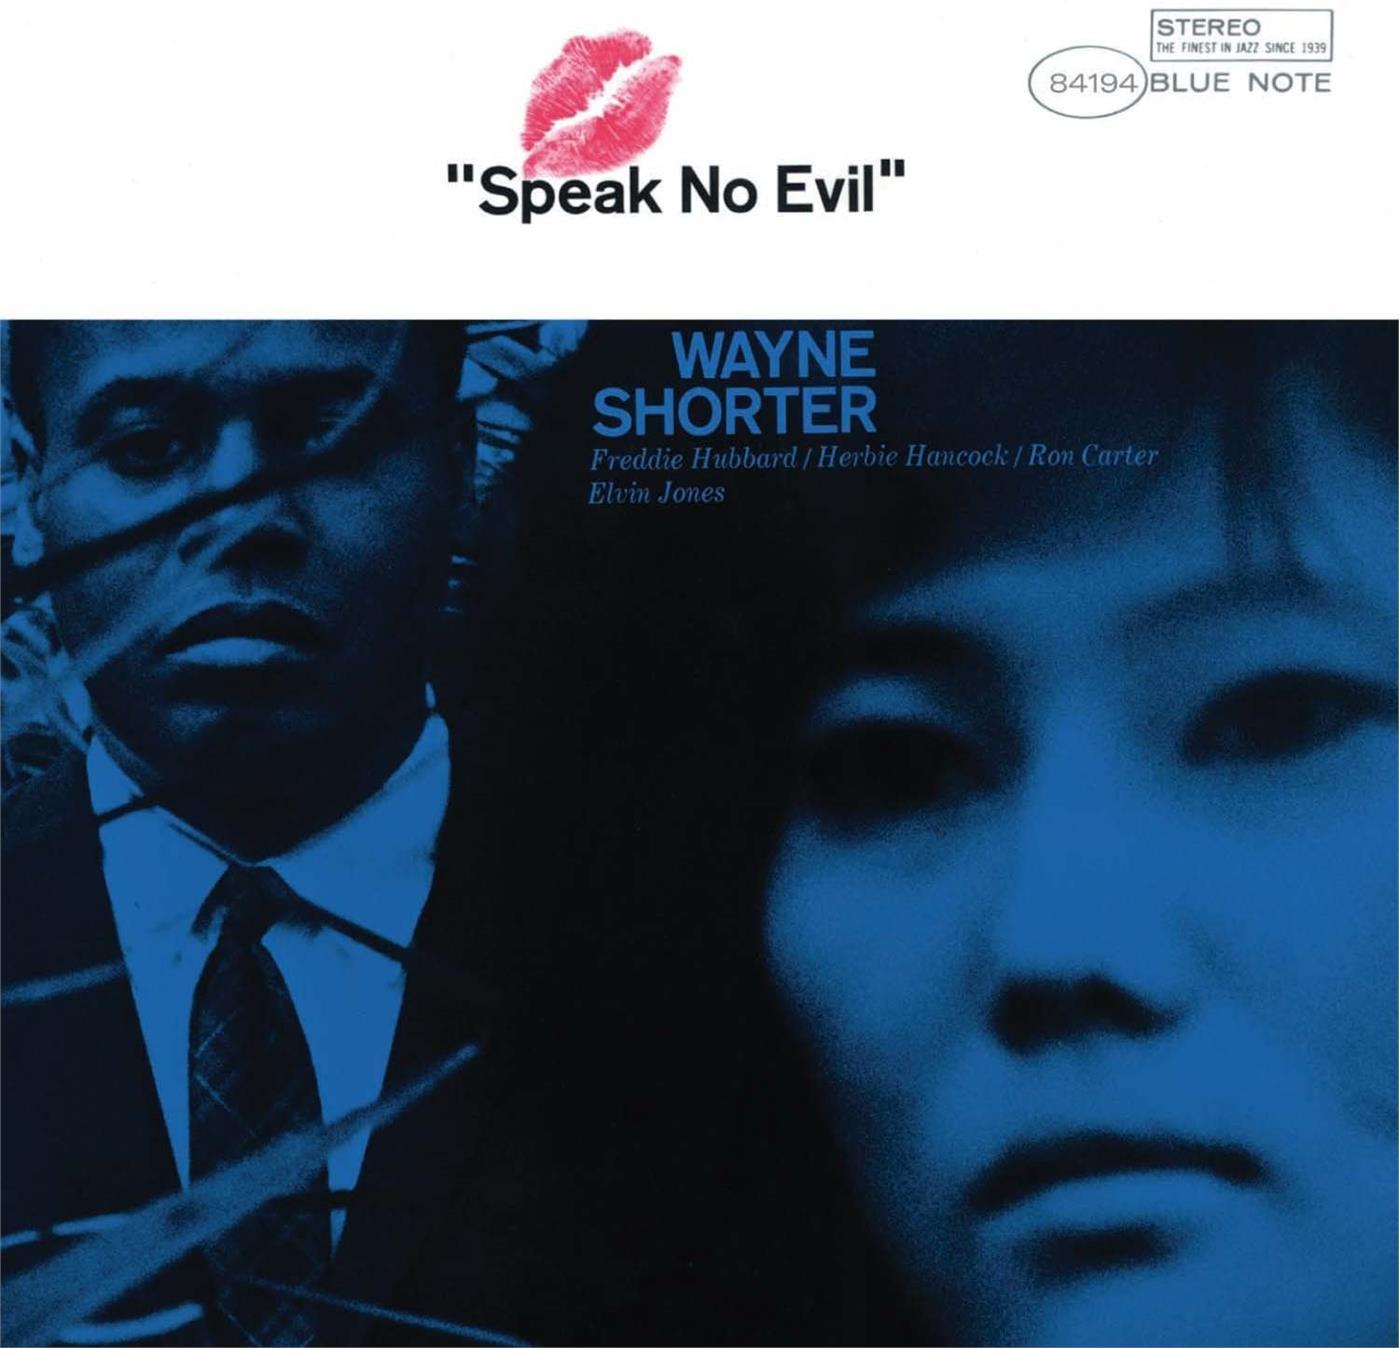 Wayne Shorter - Speak No Evil [LP]